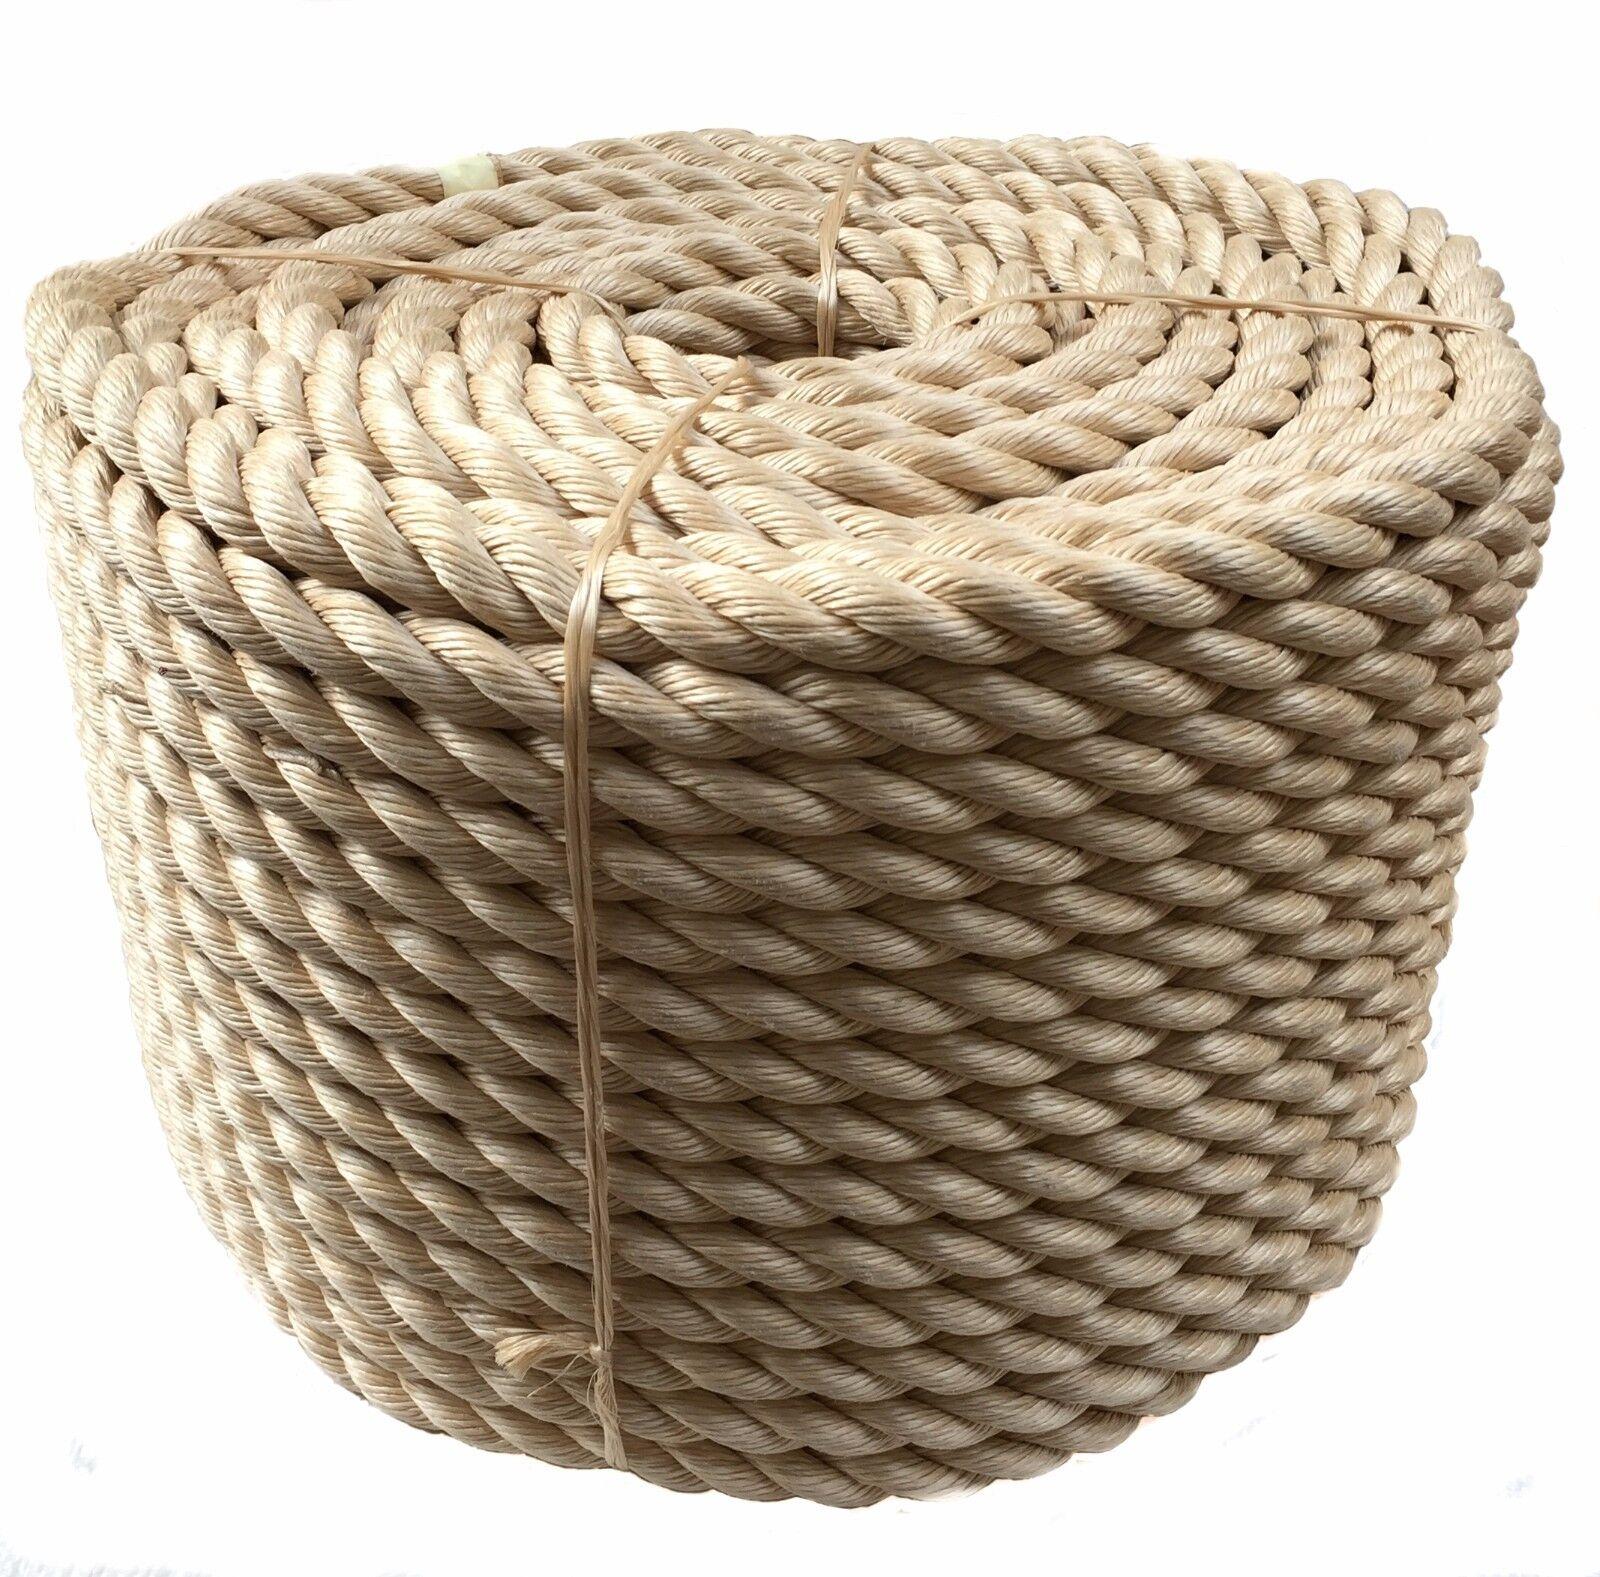 Rope - Synthetic Sisal, Sisal, Sisal For Decking, Garden & Boating, 24mm x 100m